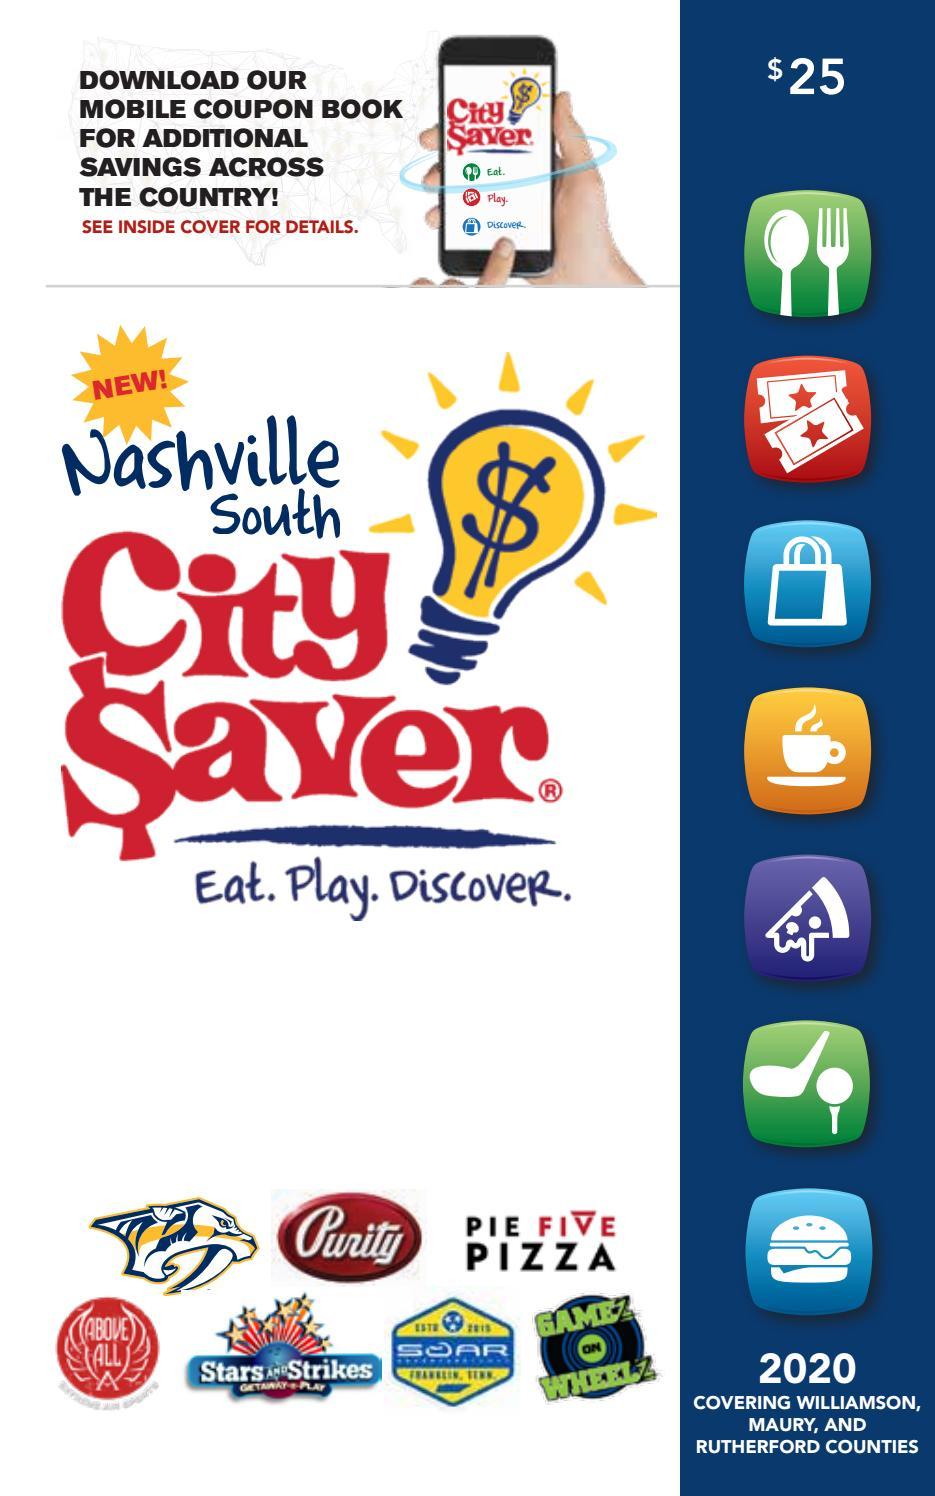 2020 Nashville South City Saver Coupon Book By Southwestern